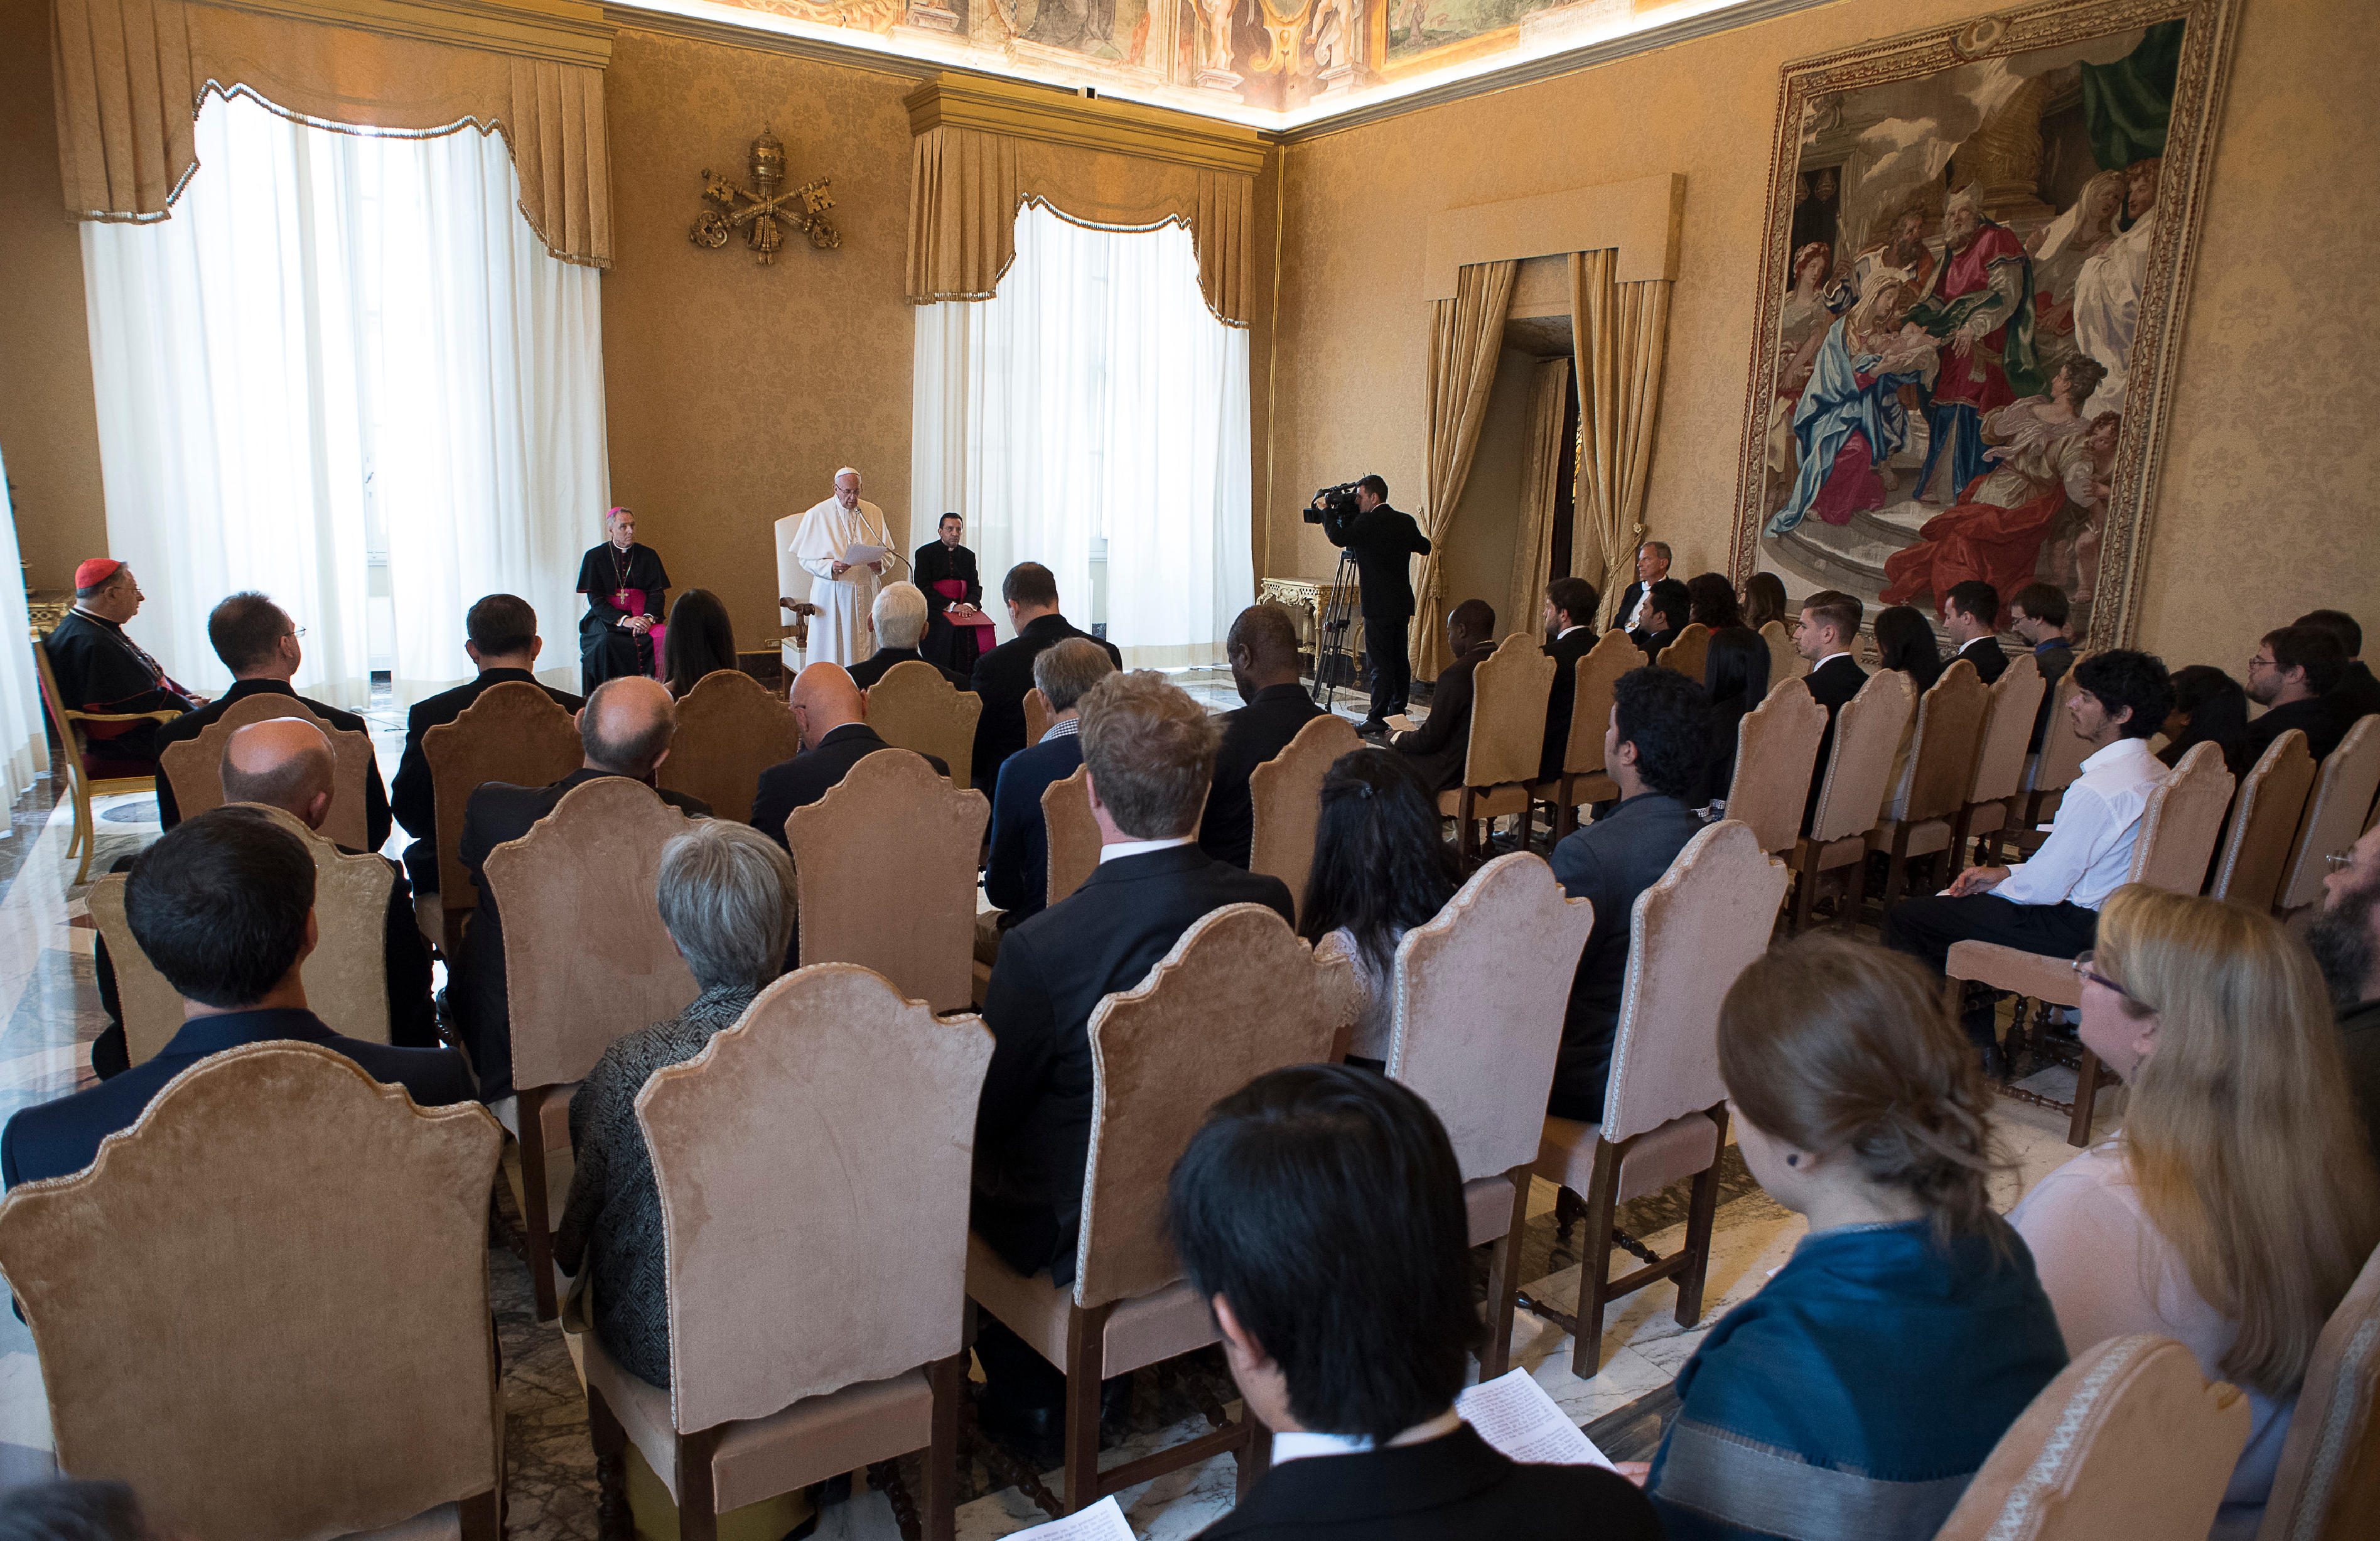 11 juin 2016, Specola vaticana, L'Osservatore Romano